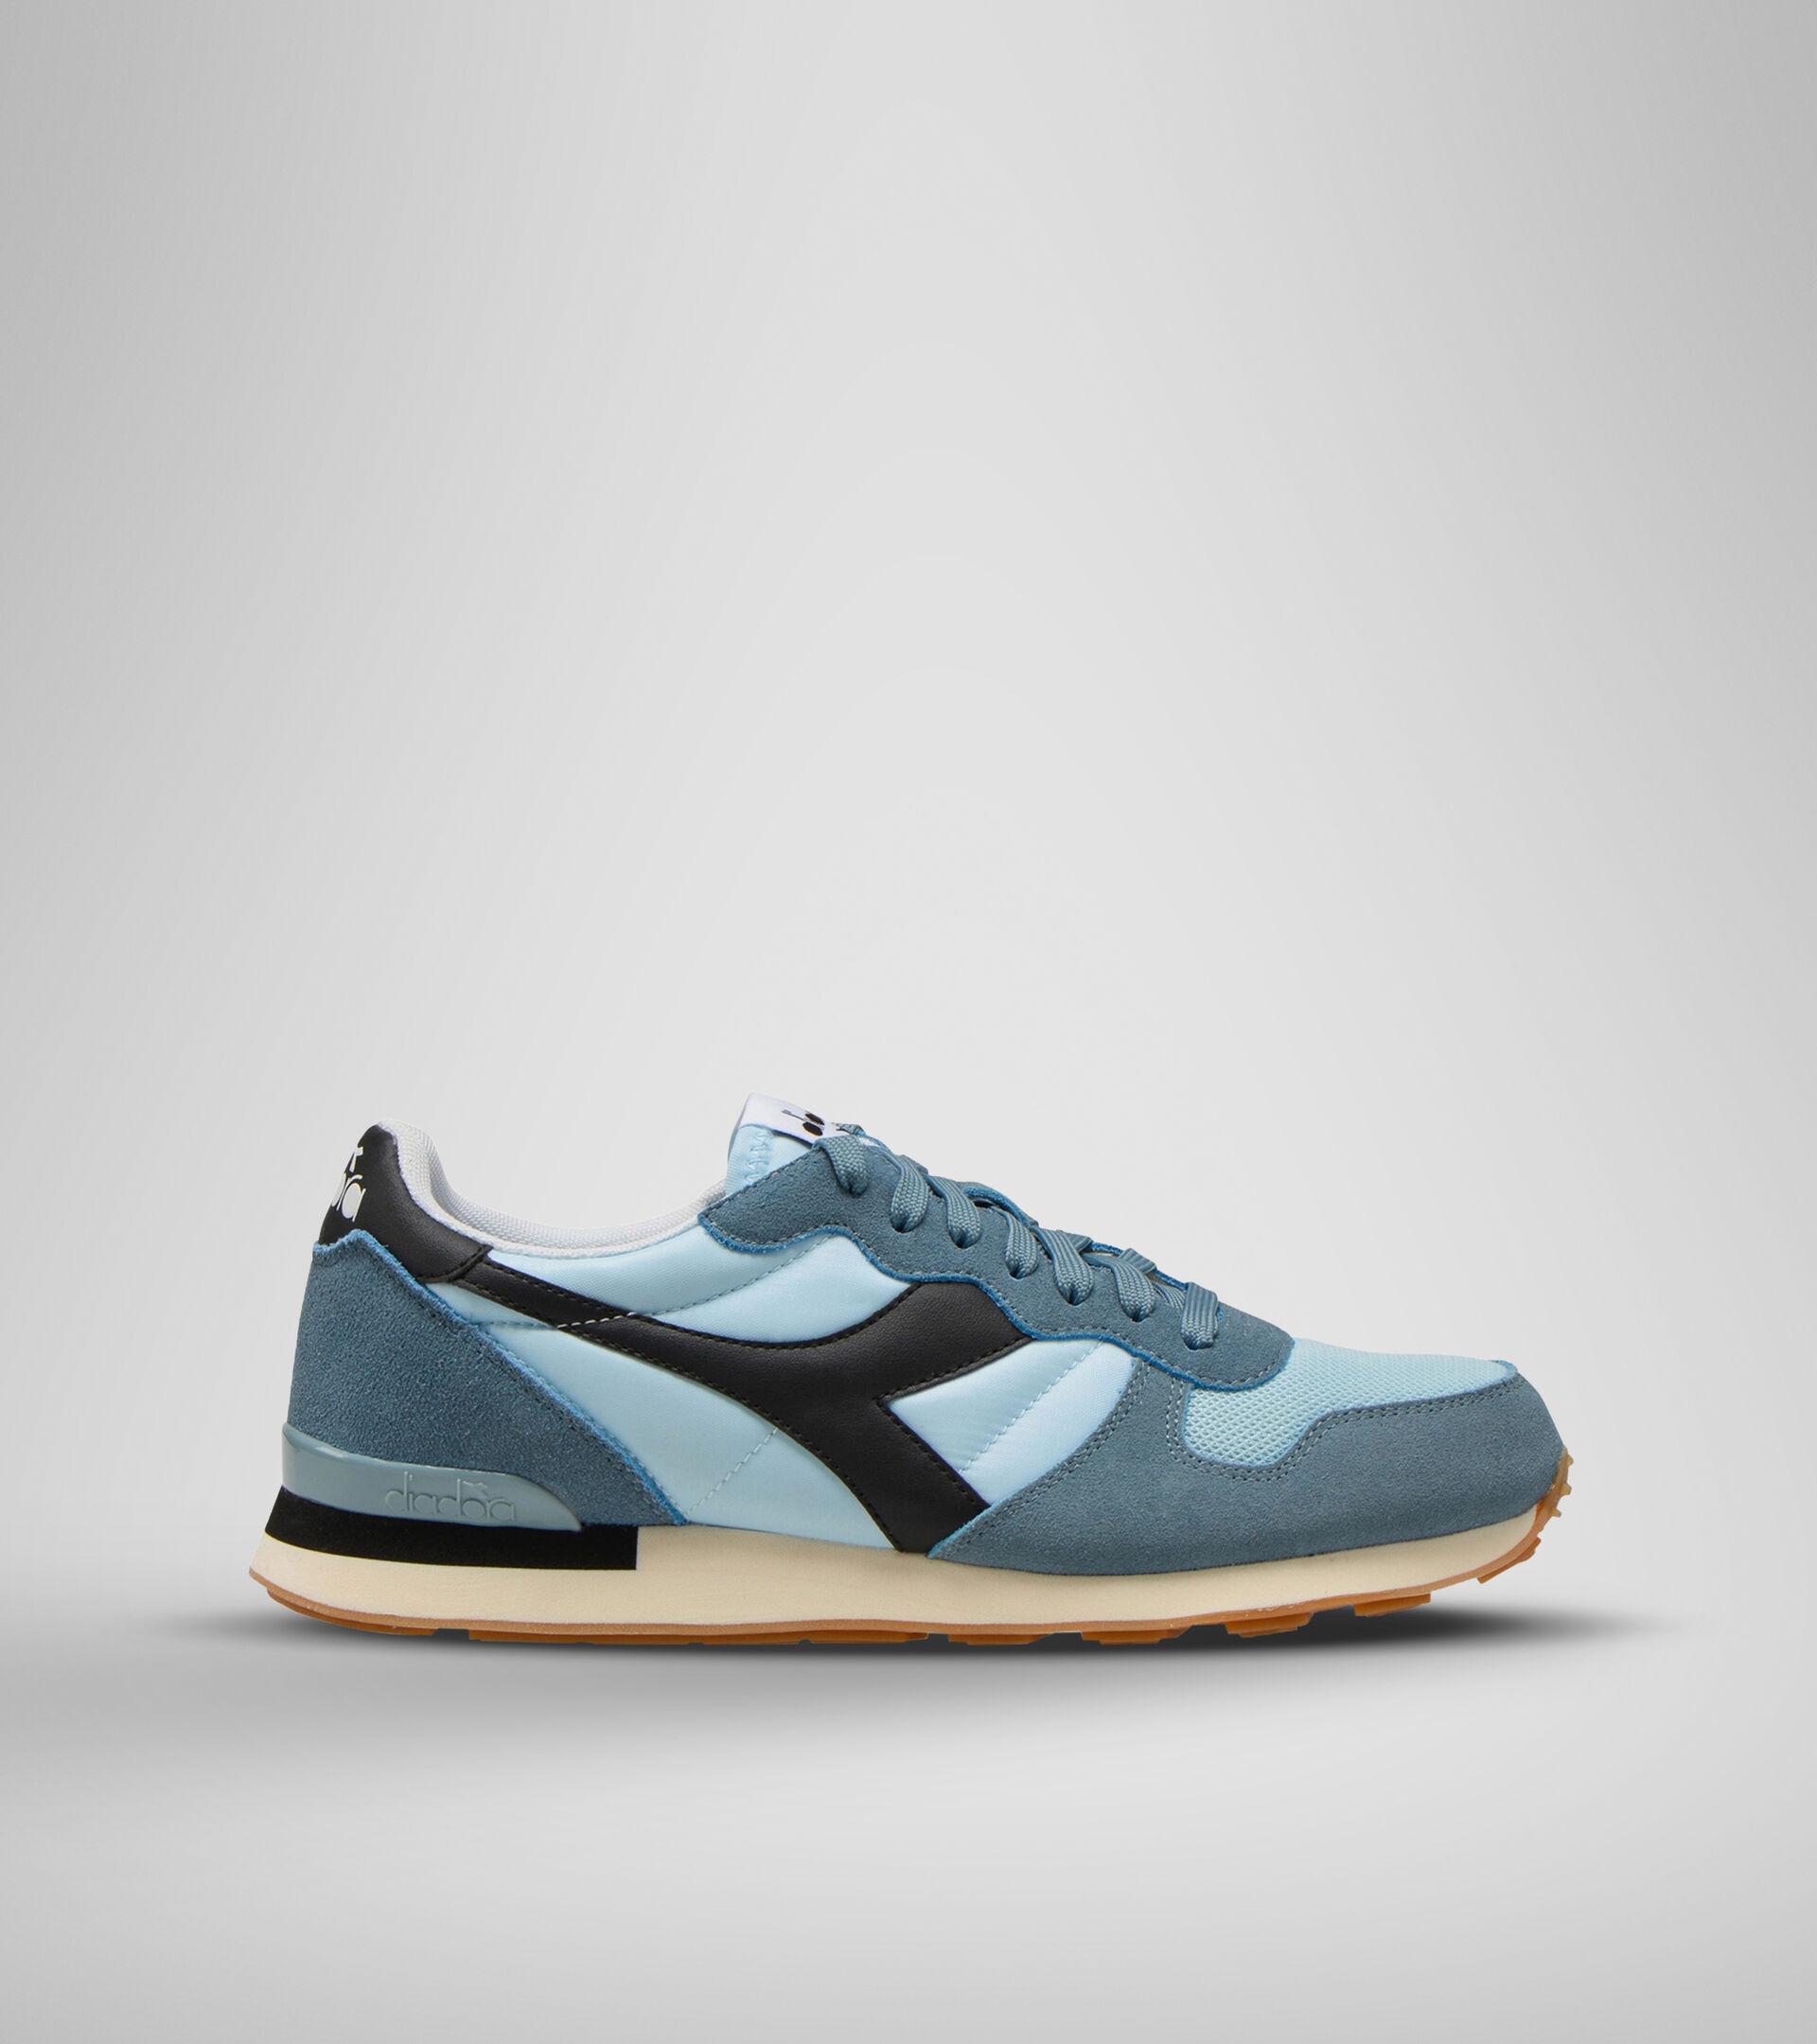 Footwear Sportswear UNISEX CAMARO ARONA/STARLIGHT BLUE/BLACK Diadora